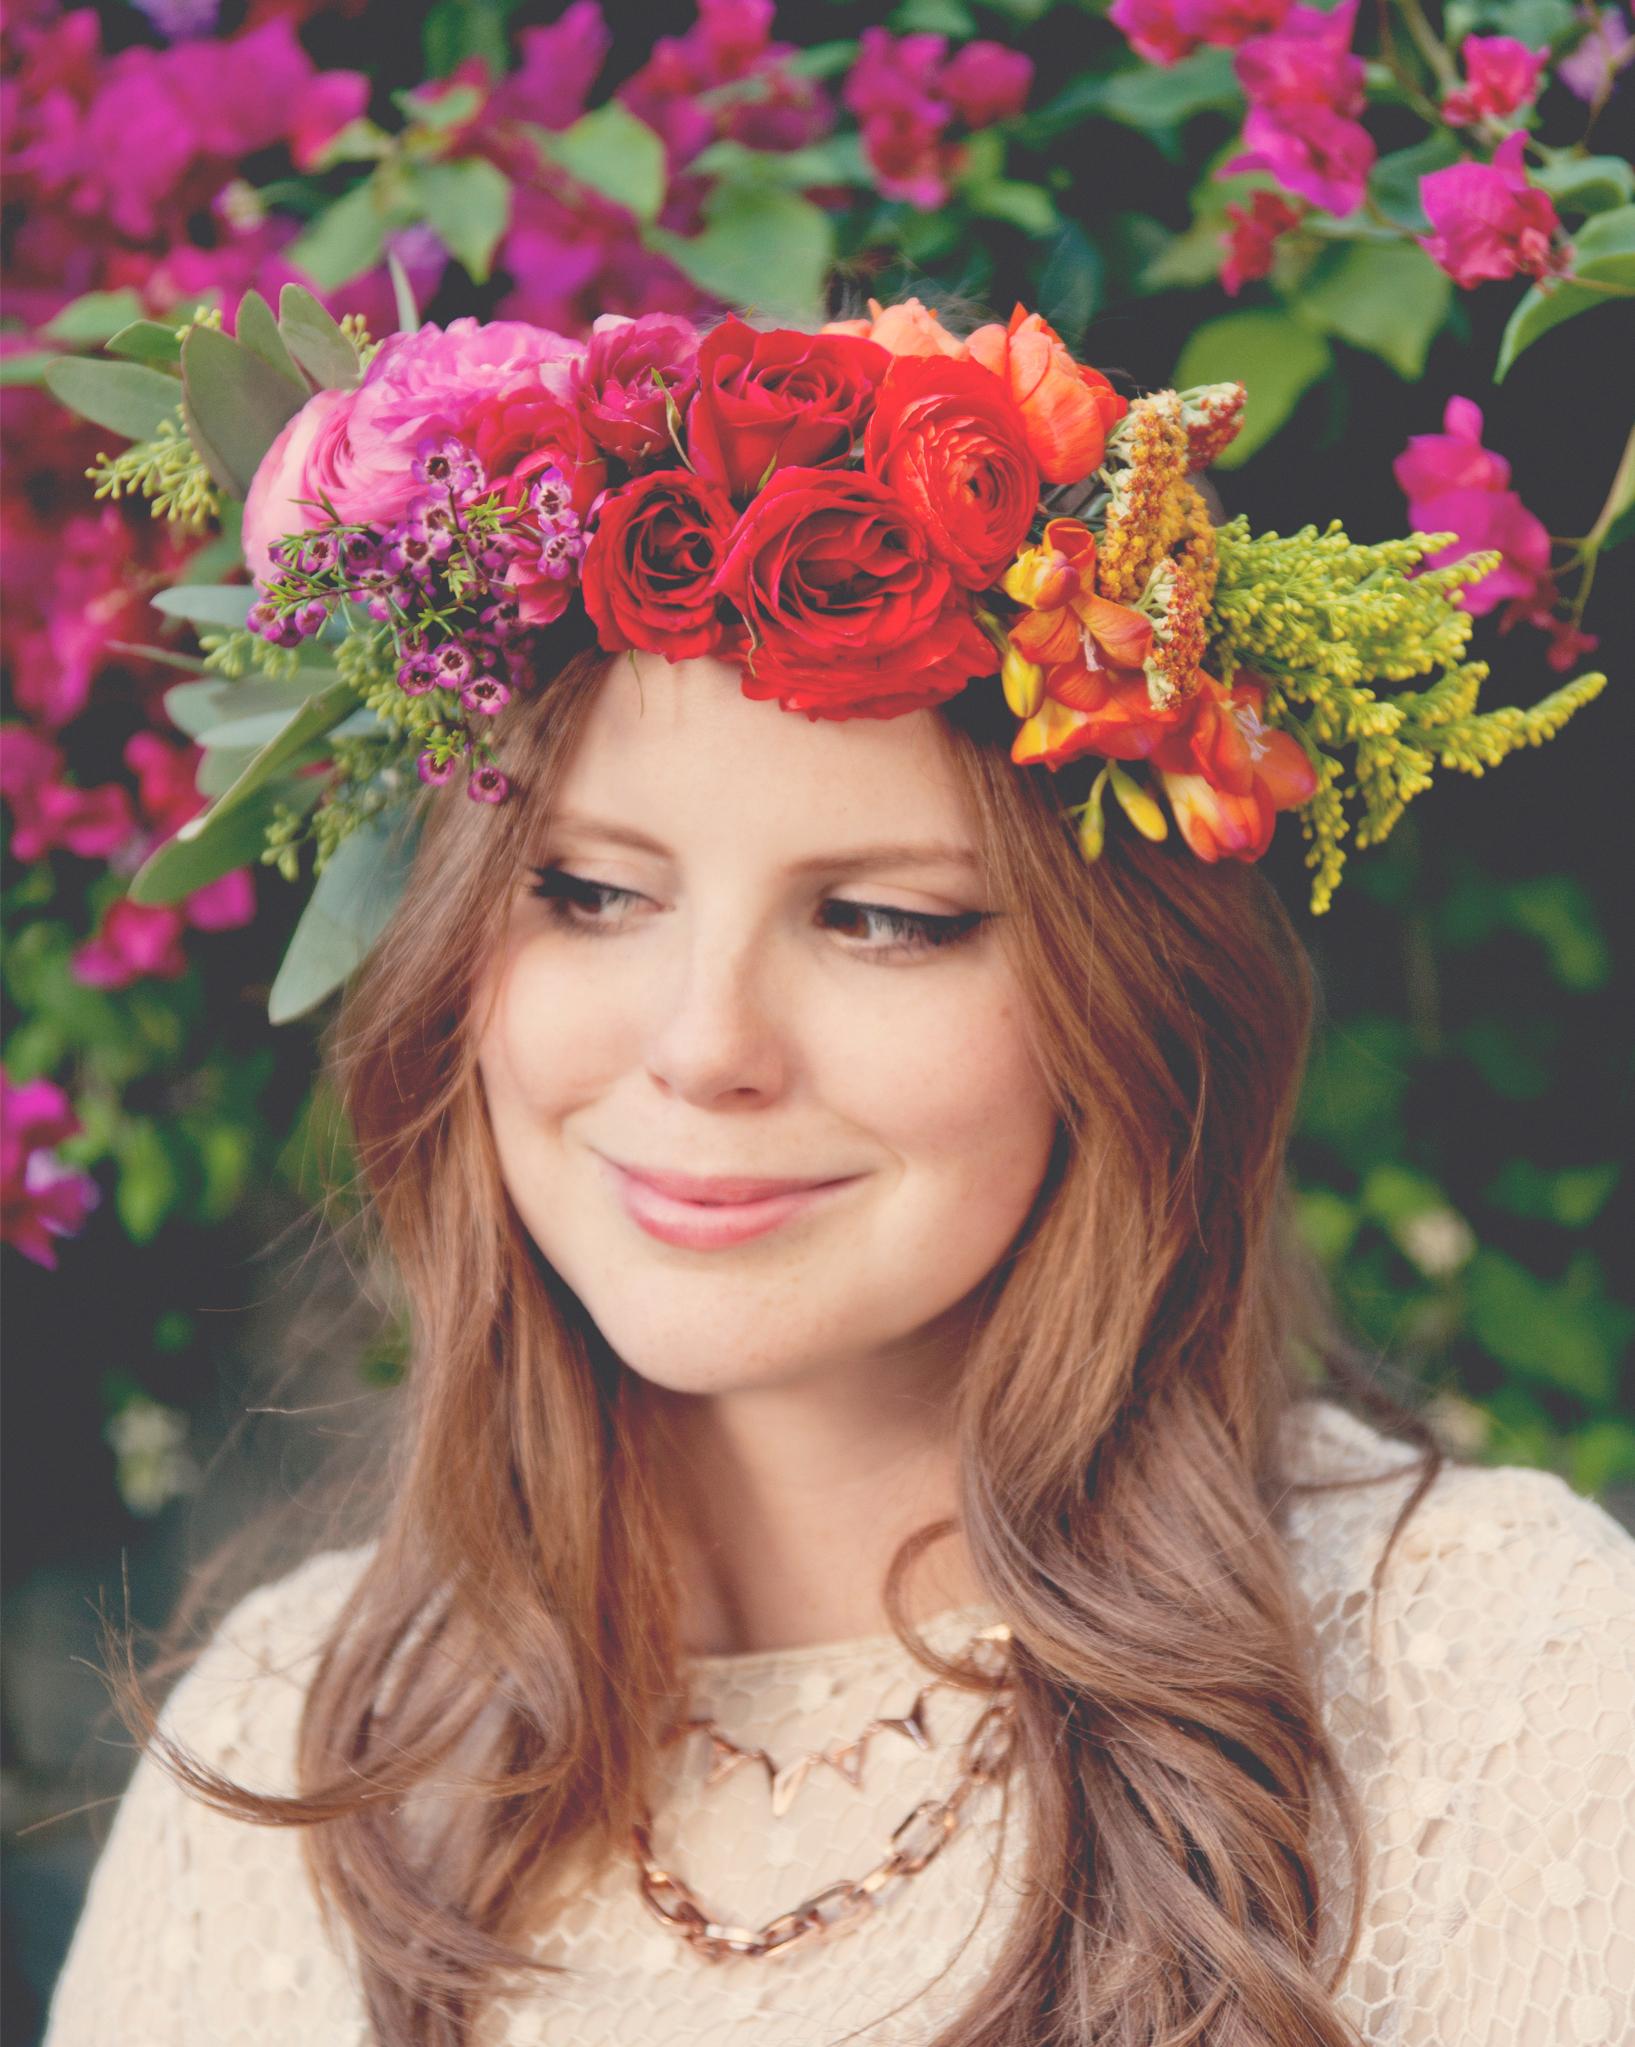 claire-thomas-bridal-shower-boho-diy-wearing-flower-crown-close-0814.jpg